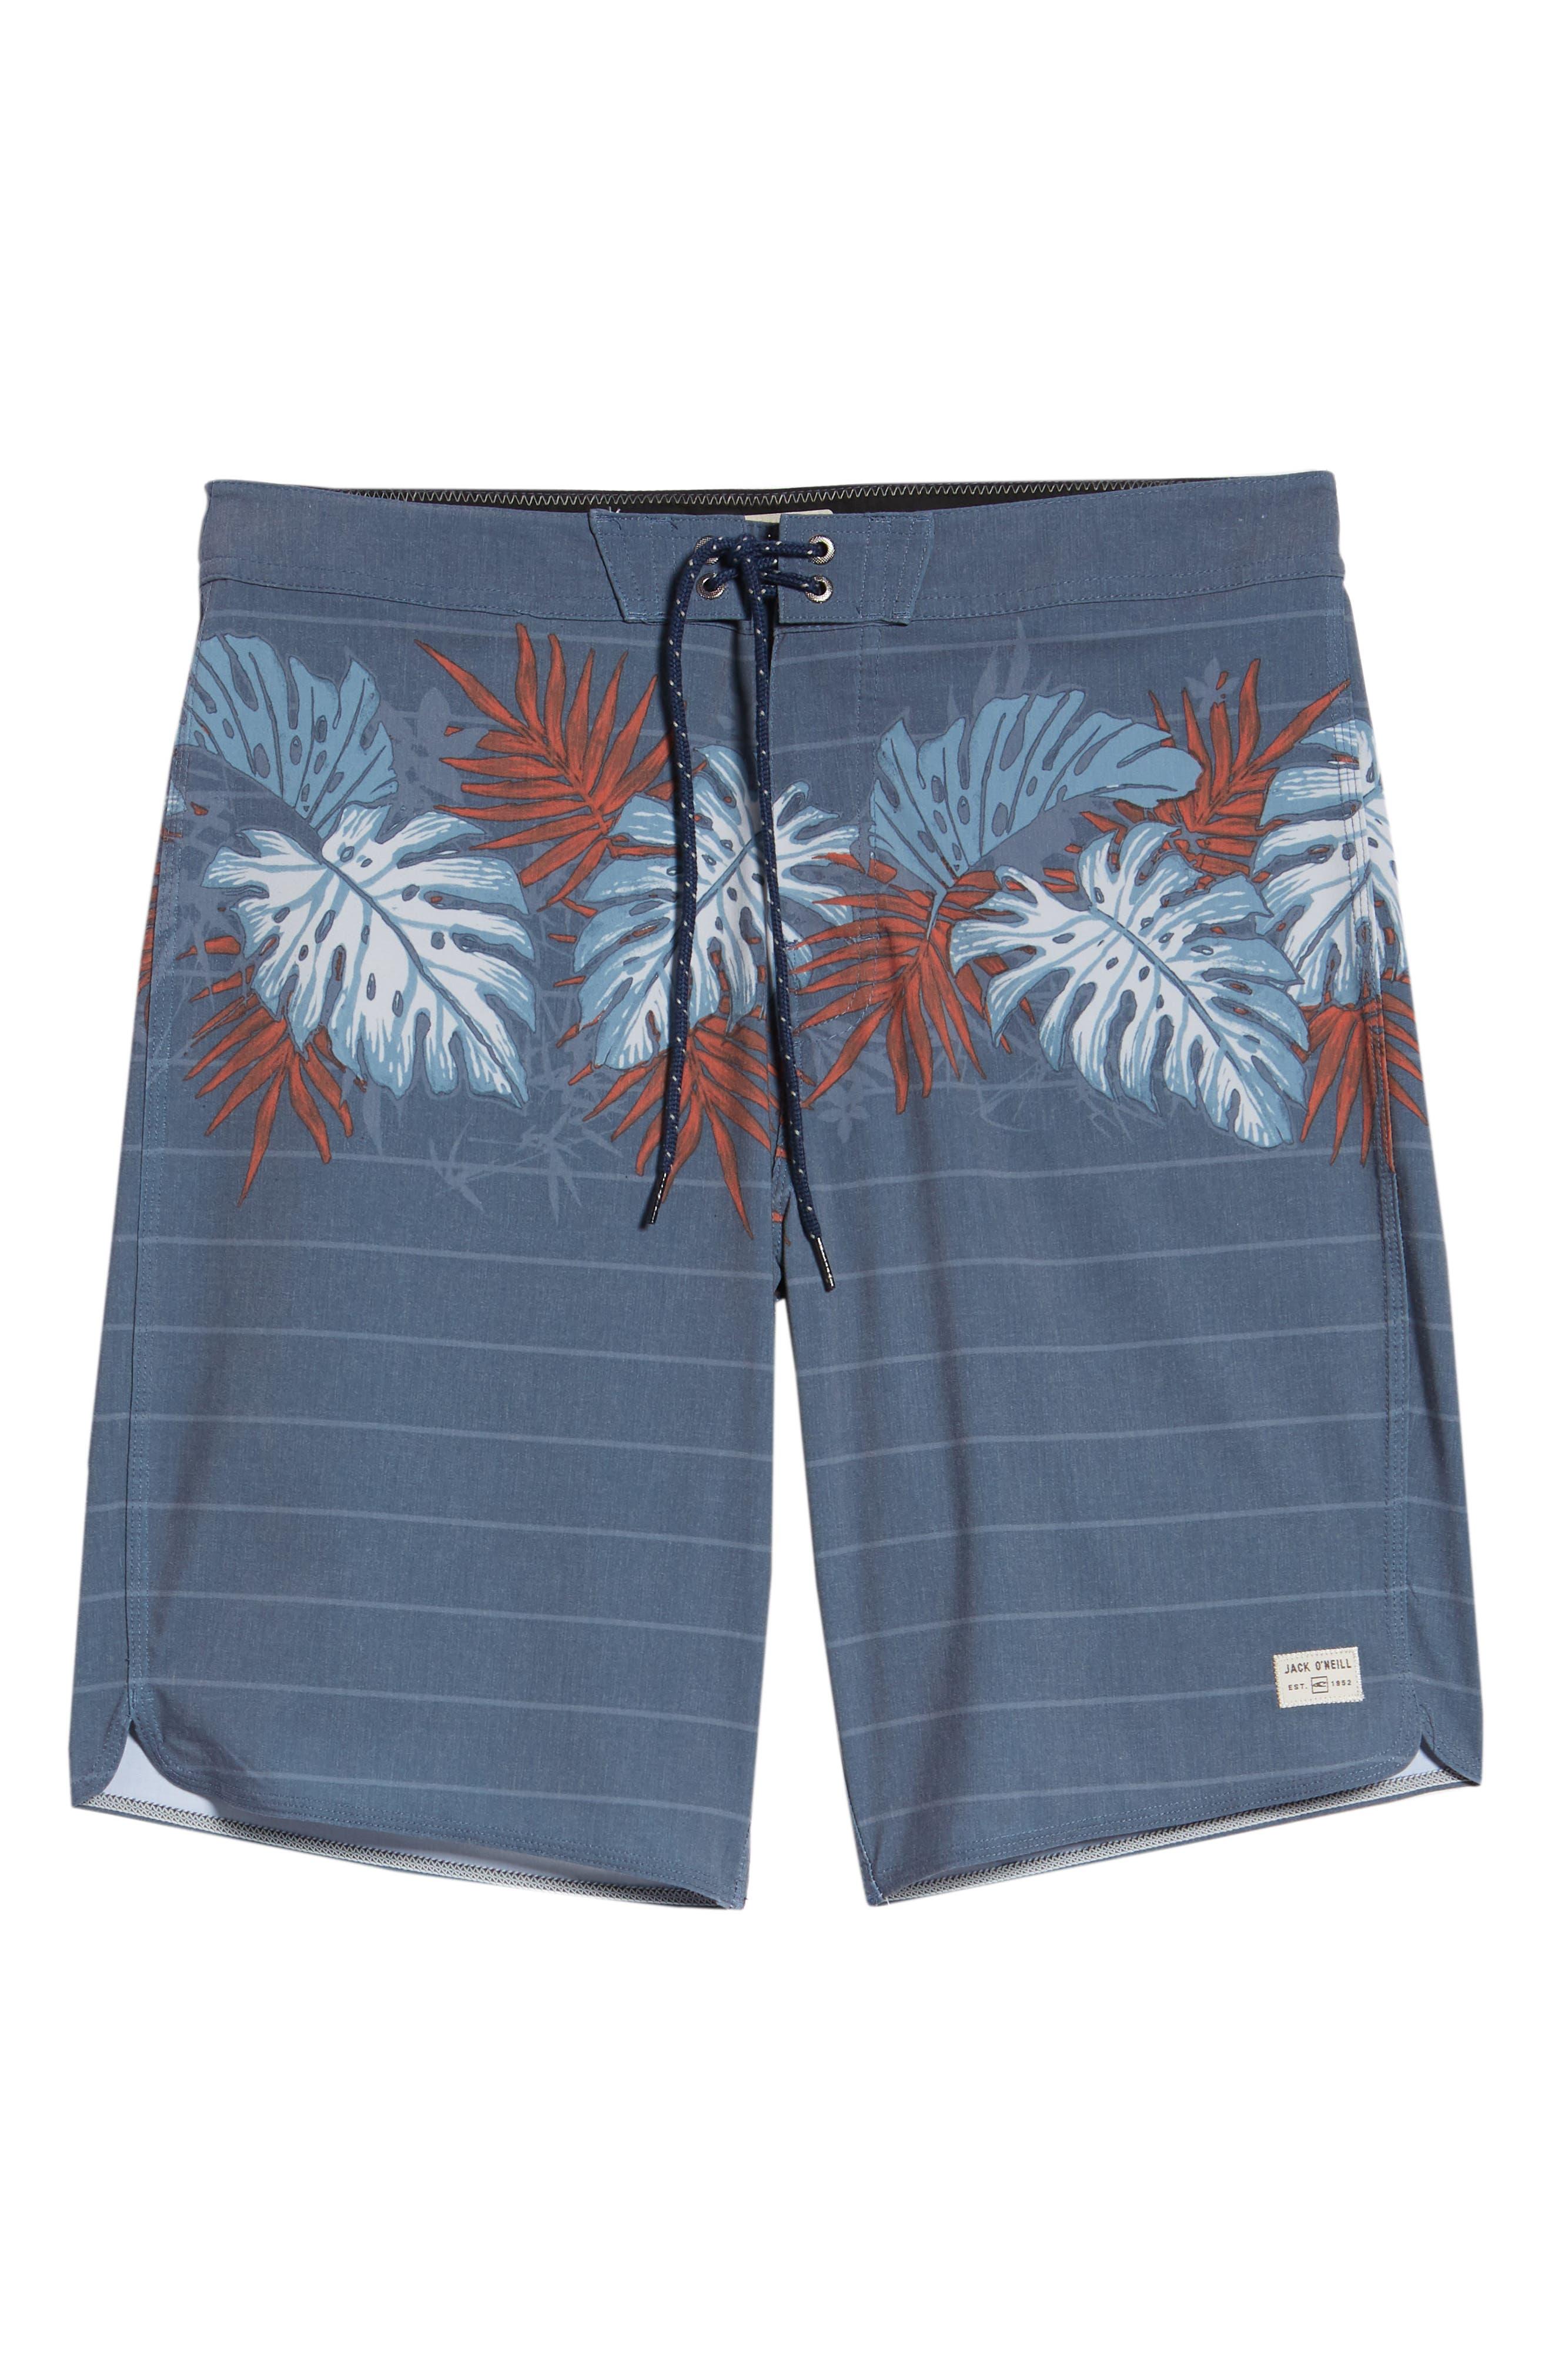 Waterfront Board Shorts,                             Alternate thumbnail 6, color,                             Navy 2